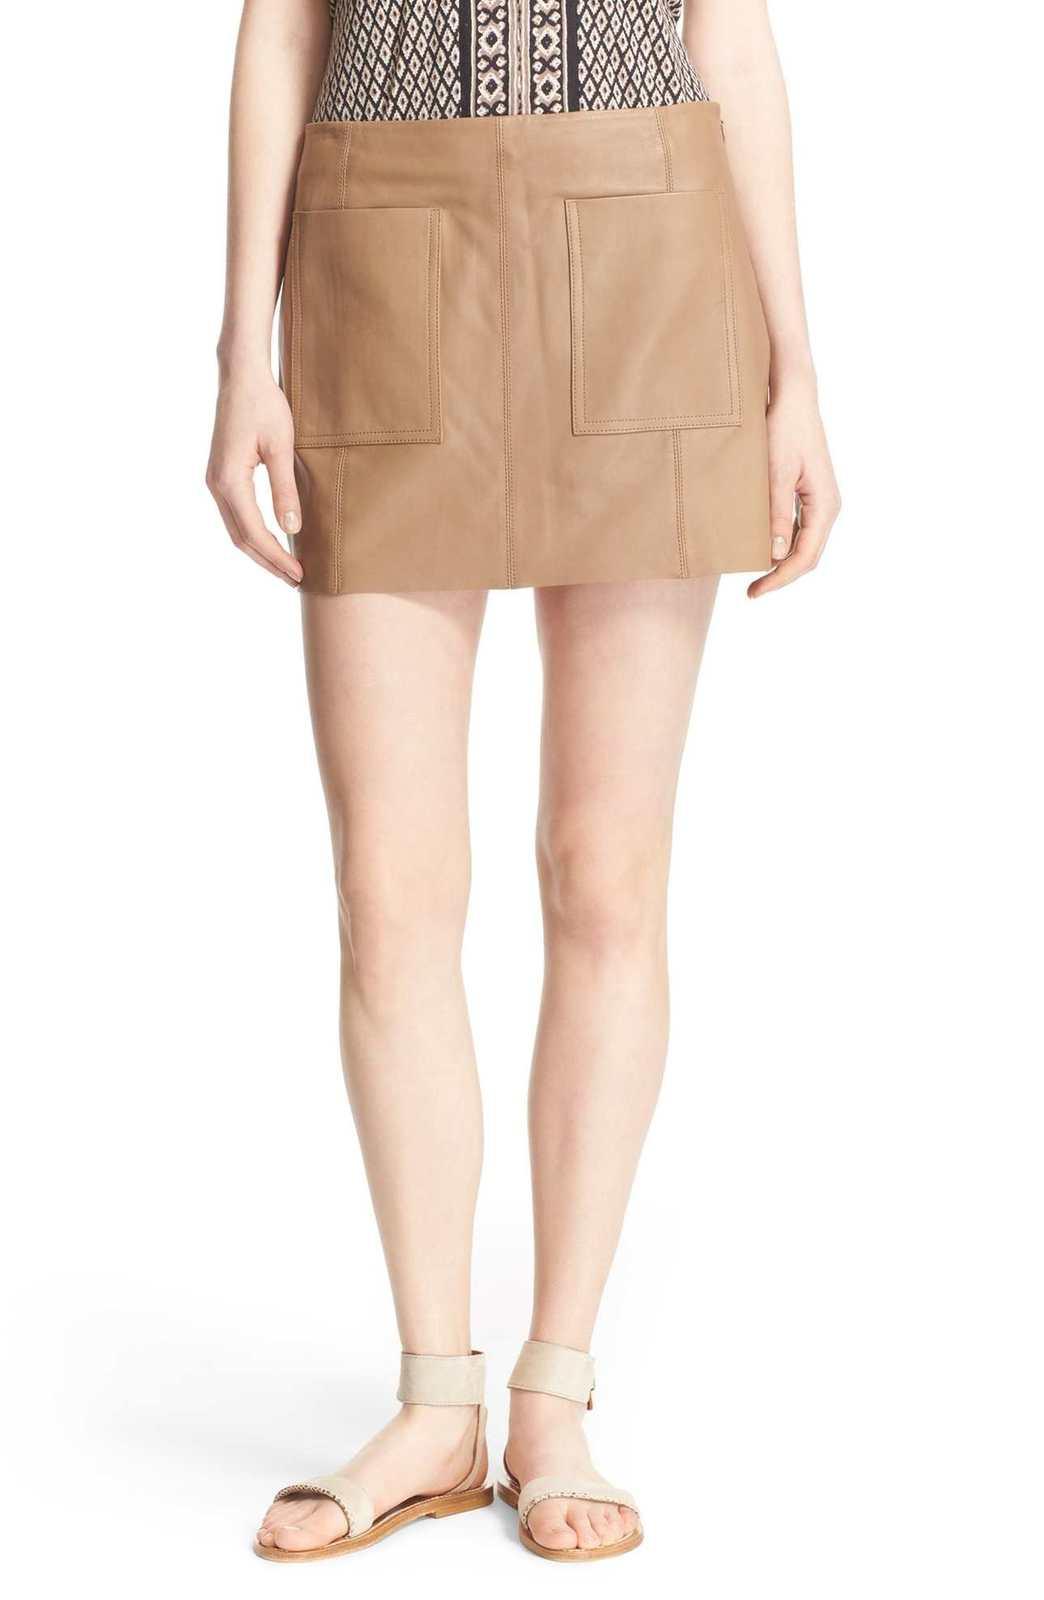 931d4cea34 Joie 'Nephrite' Leather Skirt | Pradux